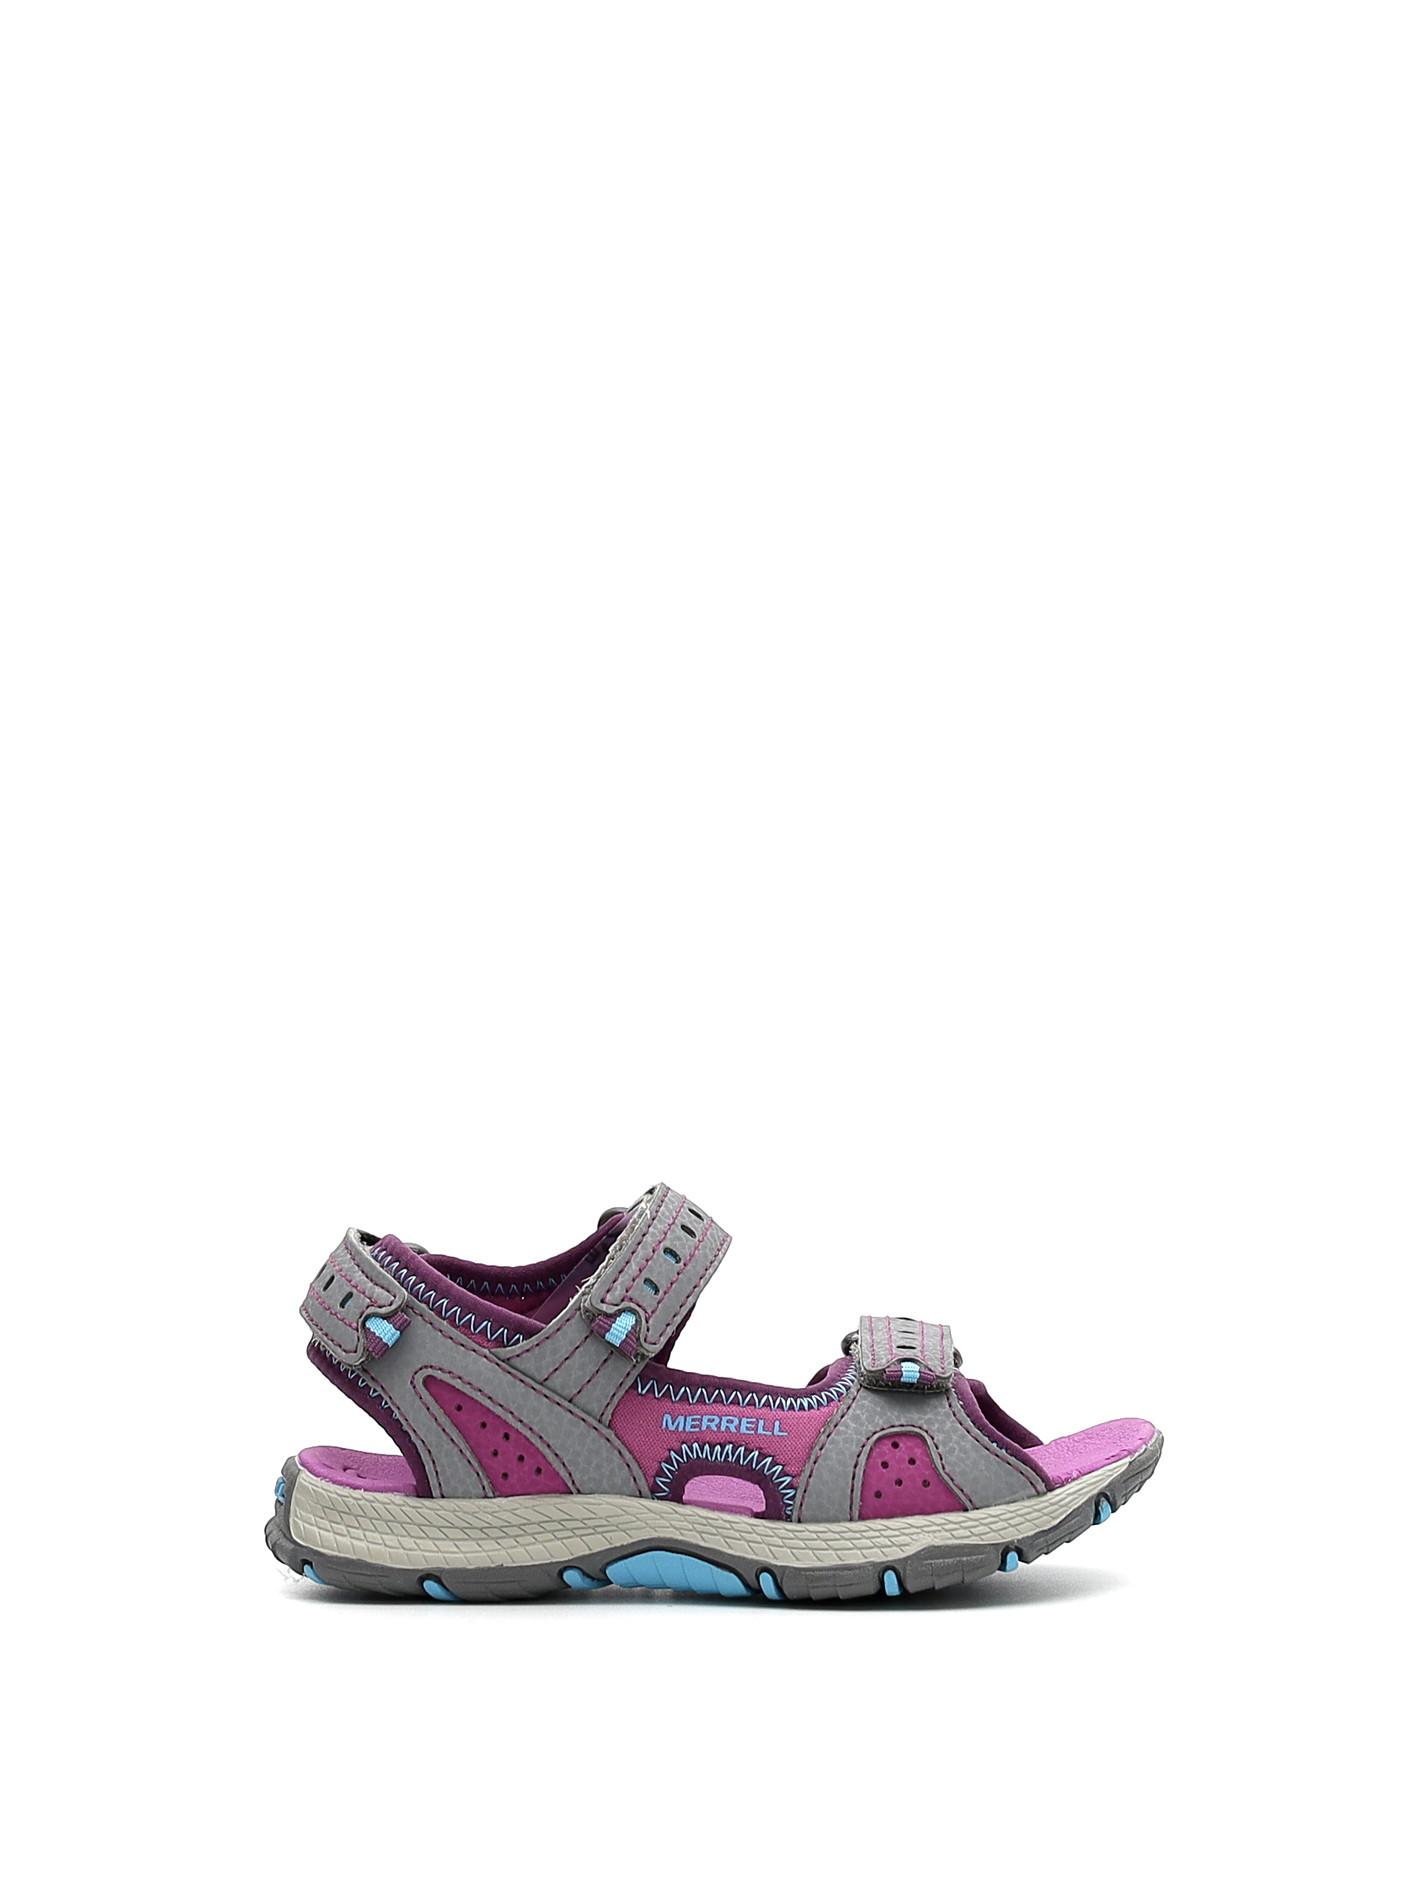 Panther sandal 2.0 - Gris pale